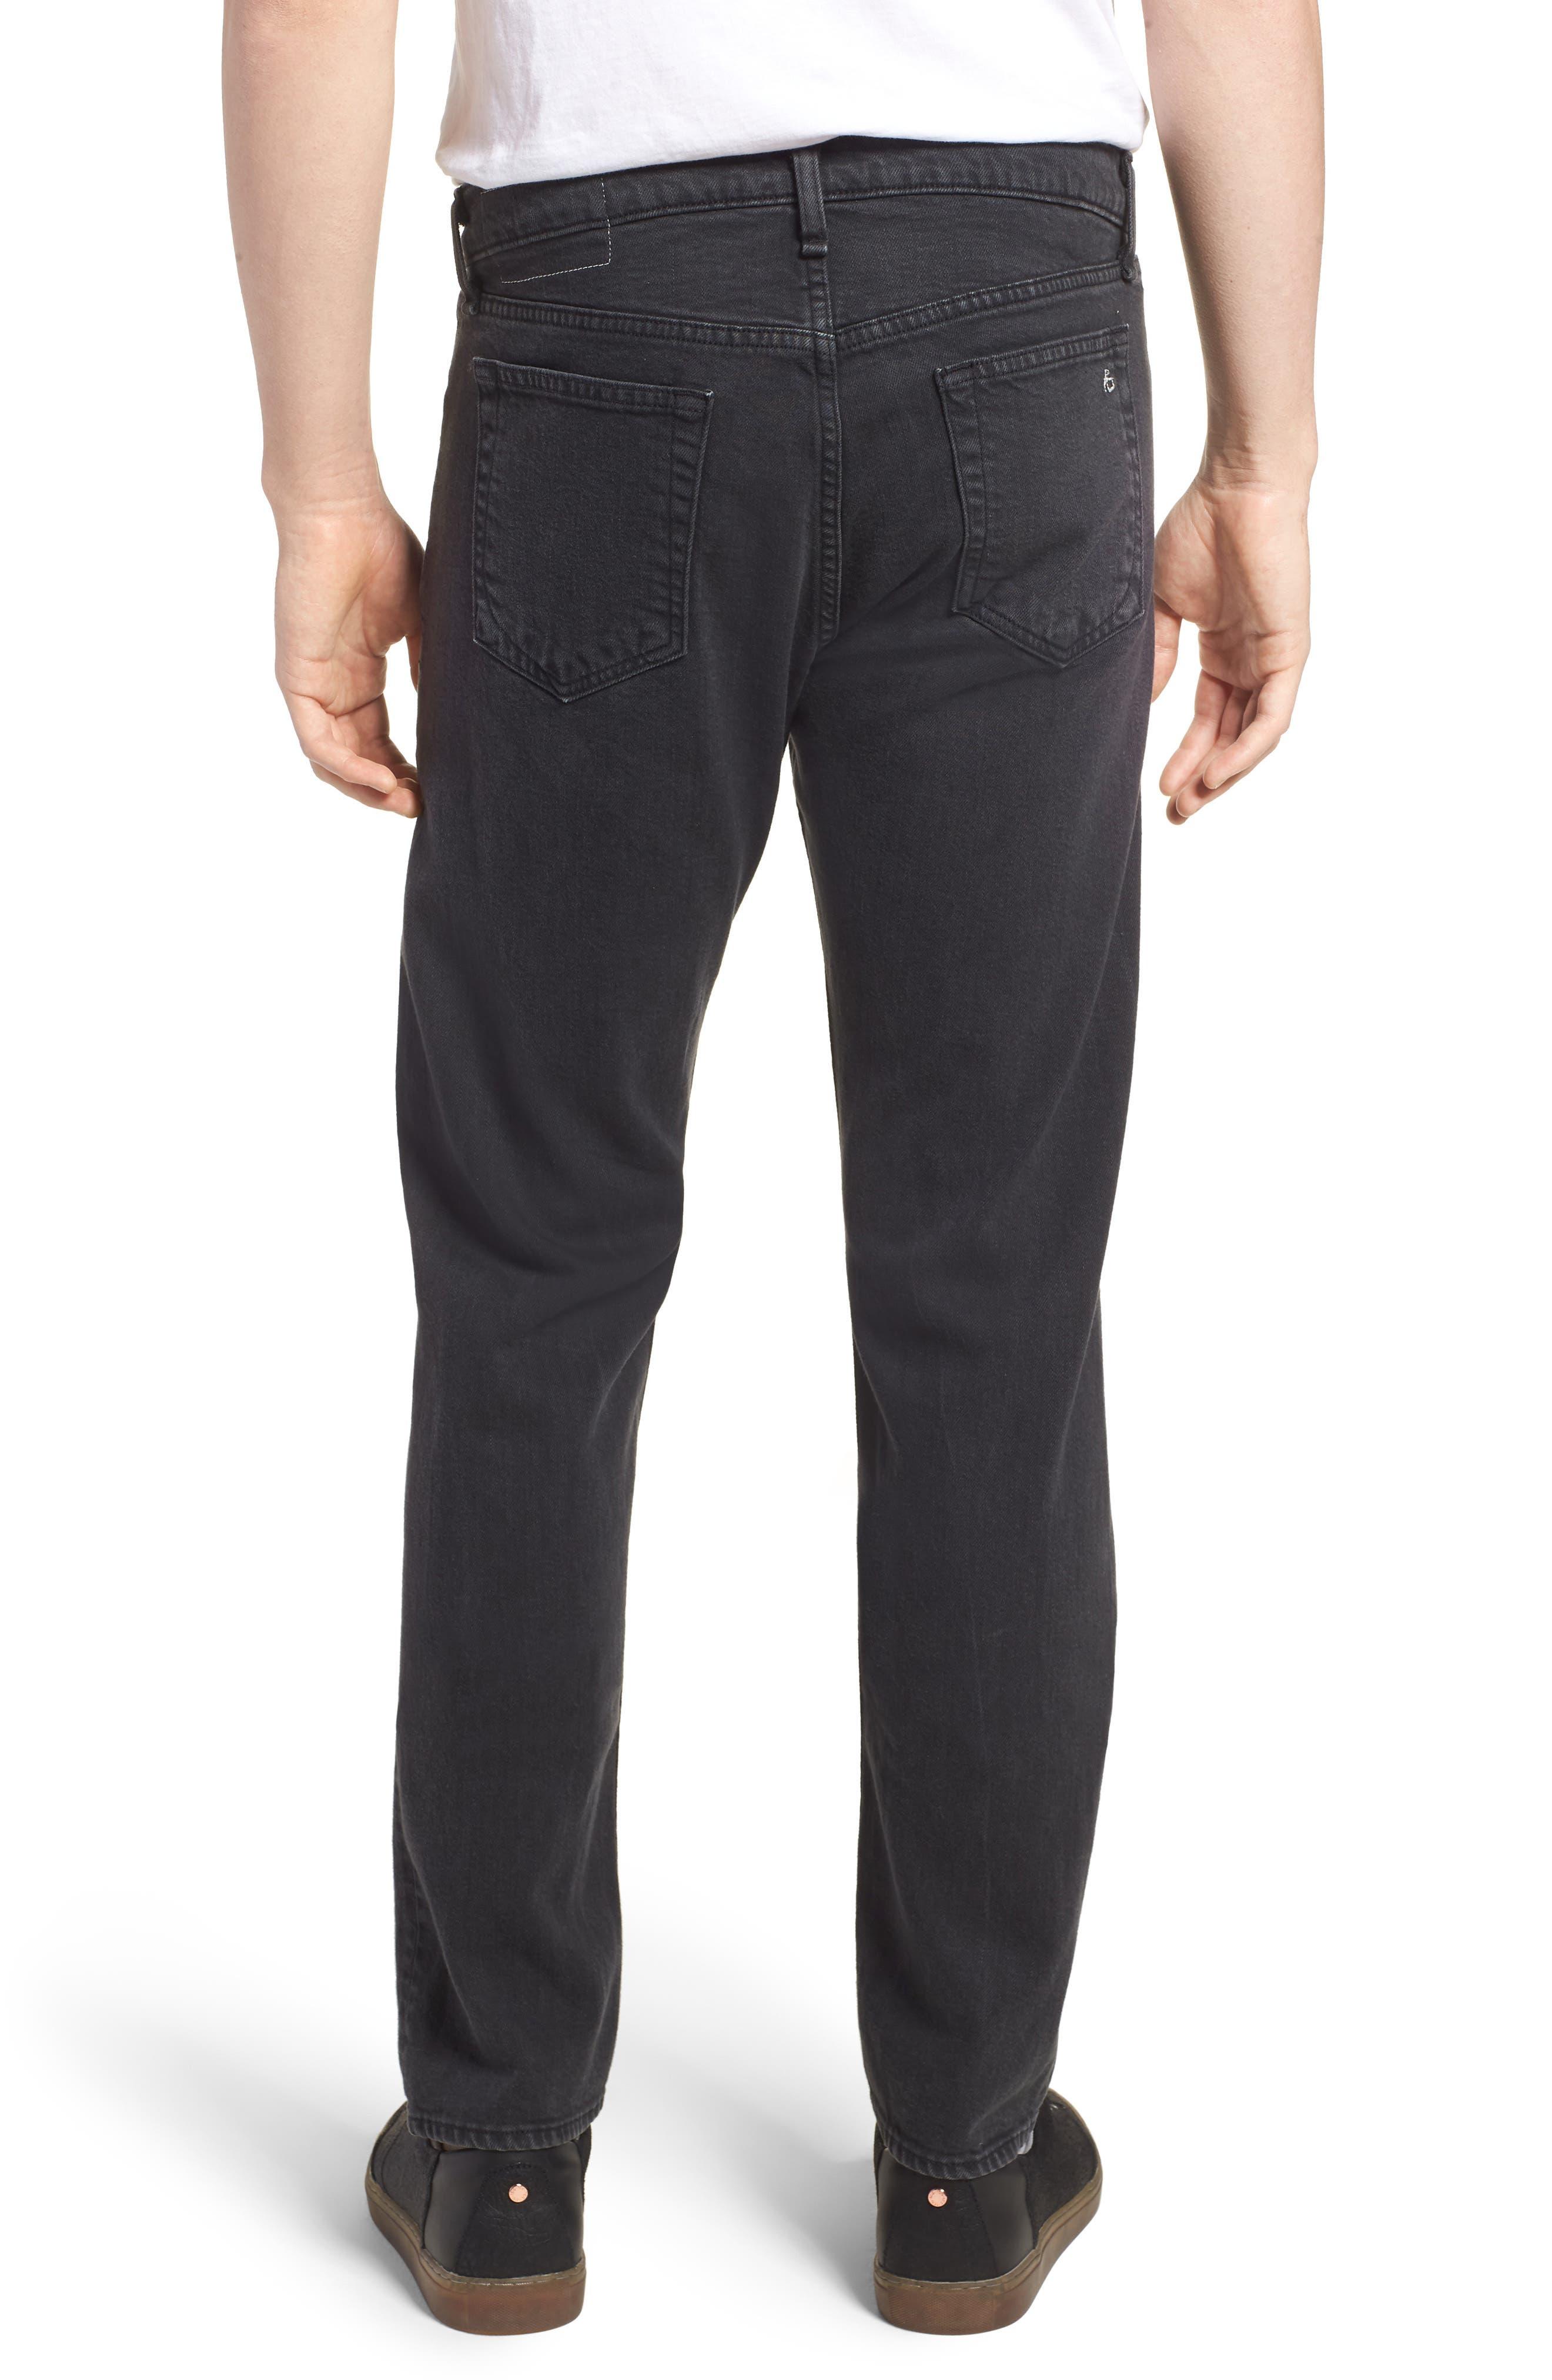 Fit 2 Slim Fit Jeans,                             Alternate thumbnail 2, color,                             SHELTER